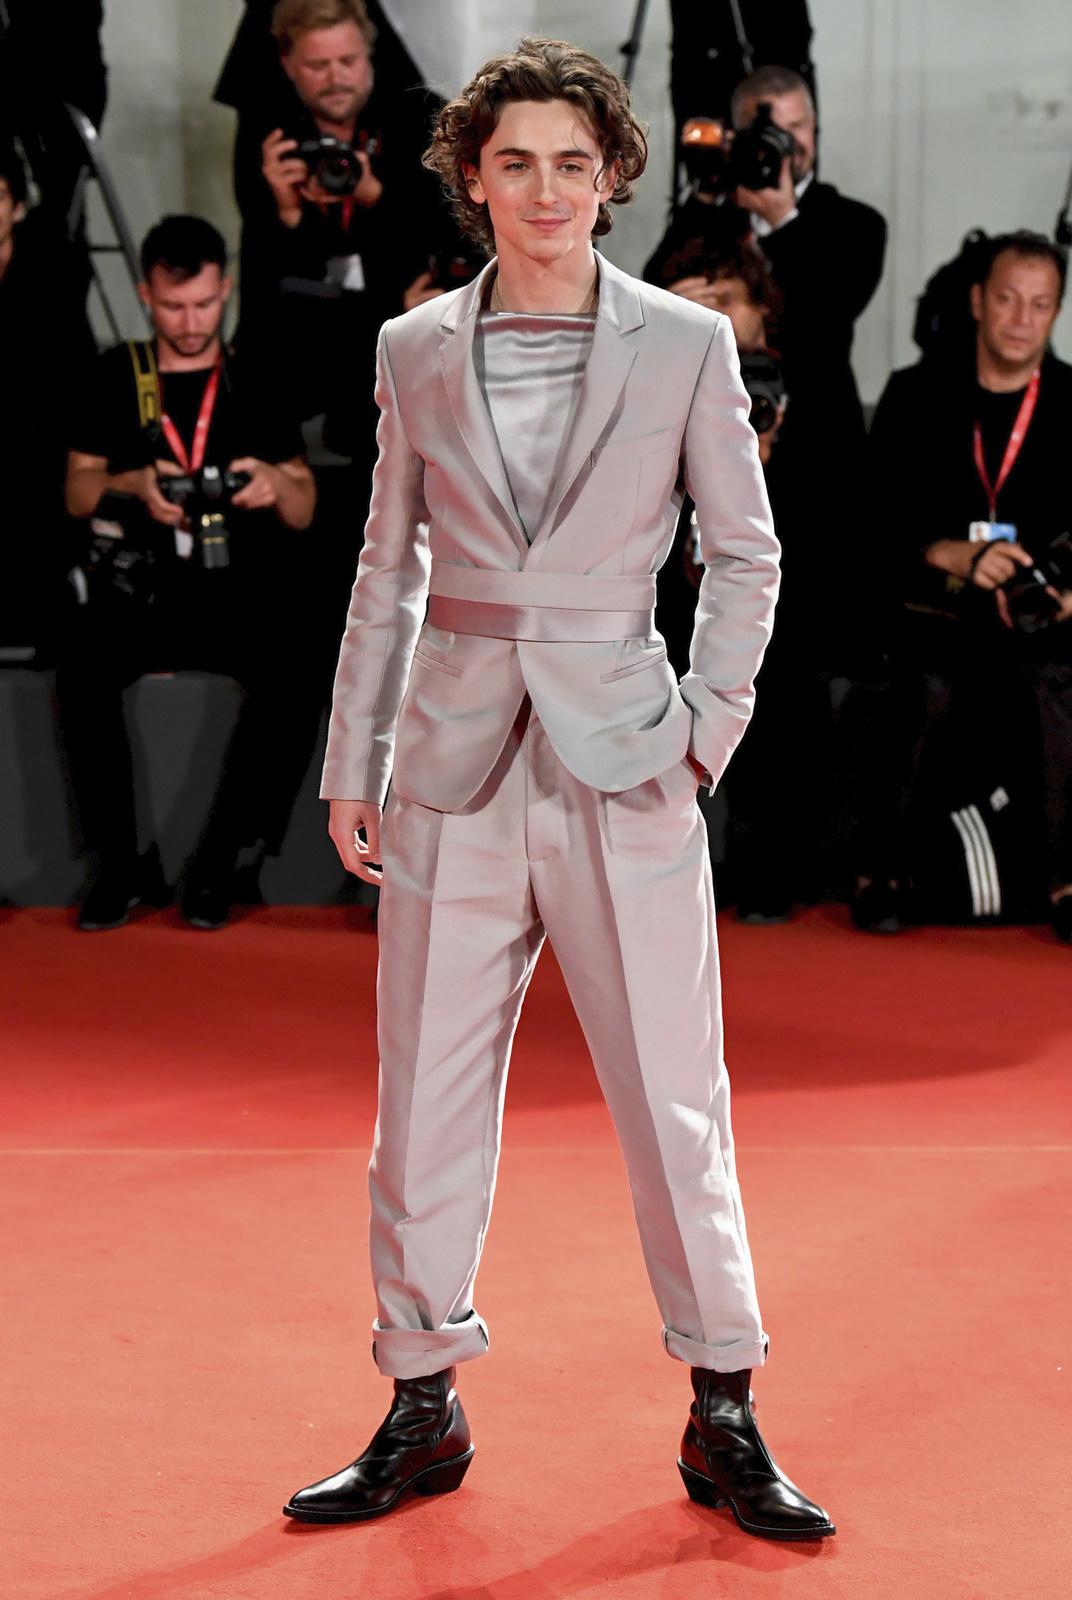 Benátský filmový festival navštívilo mnoho celebrit.